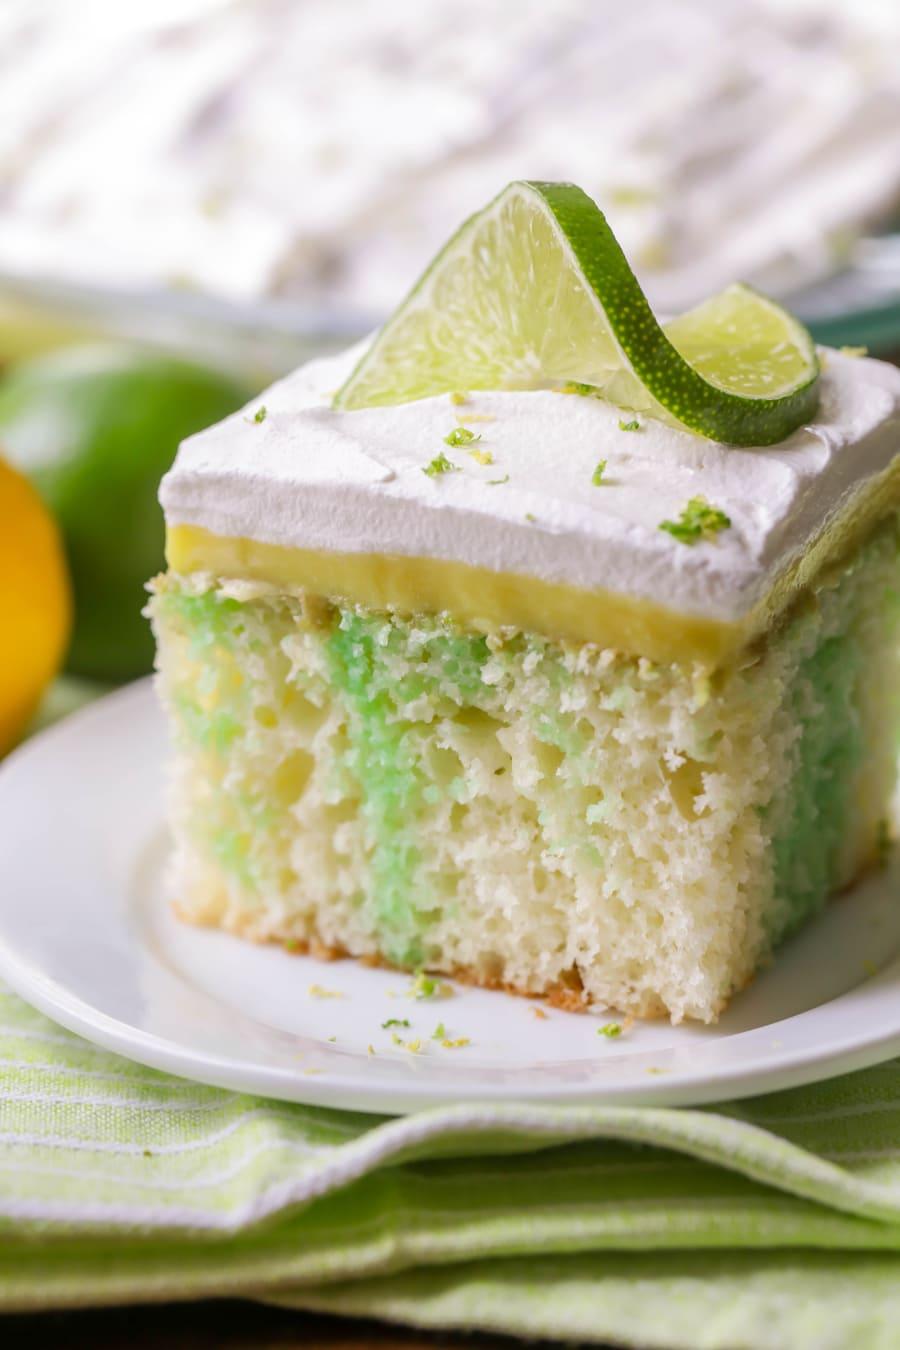 Lemon Poke Jello Cake